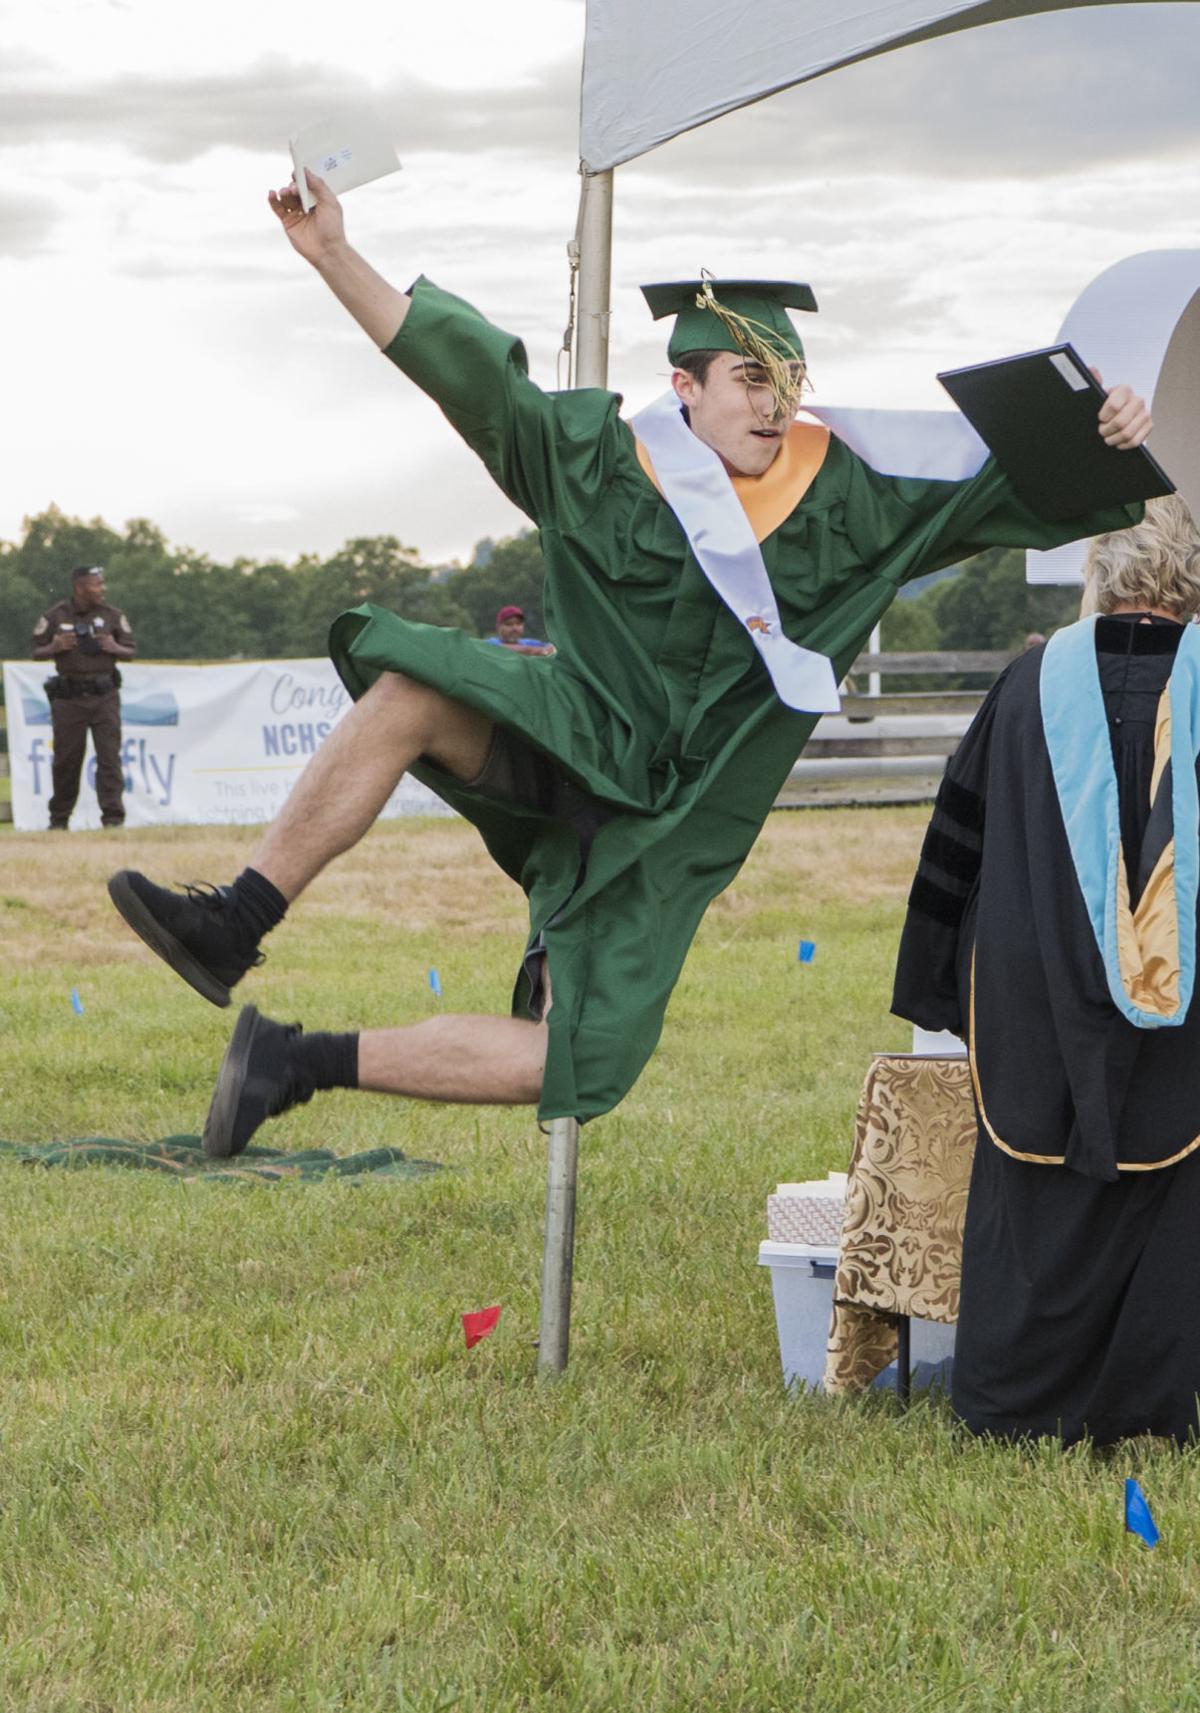 Photo: emx_20200625_nct_news_graduation_p1